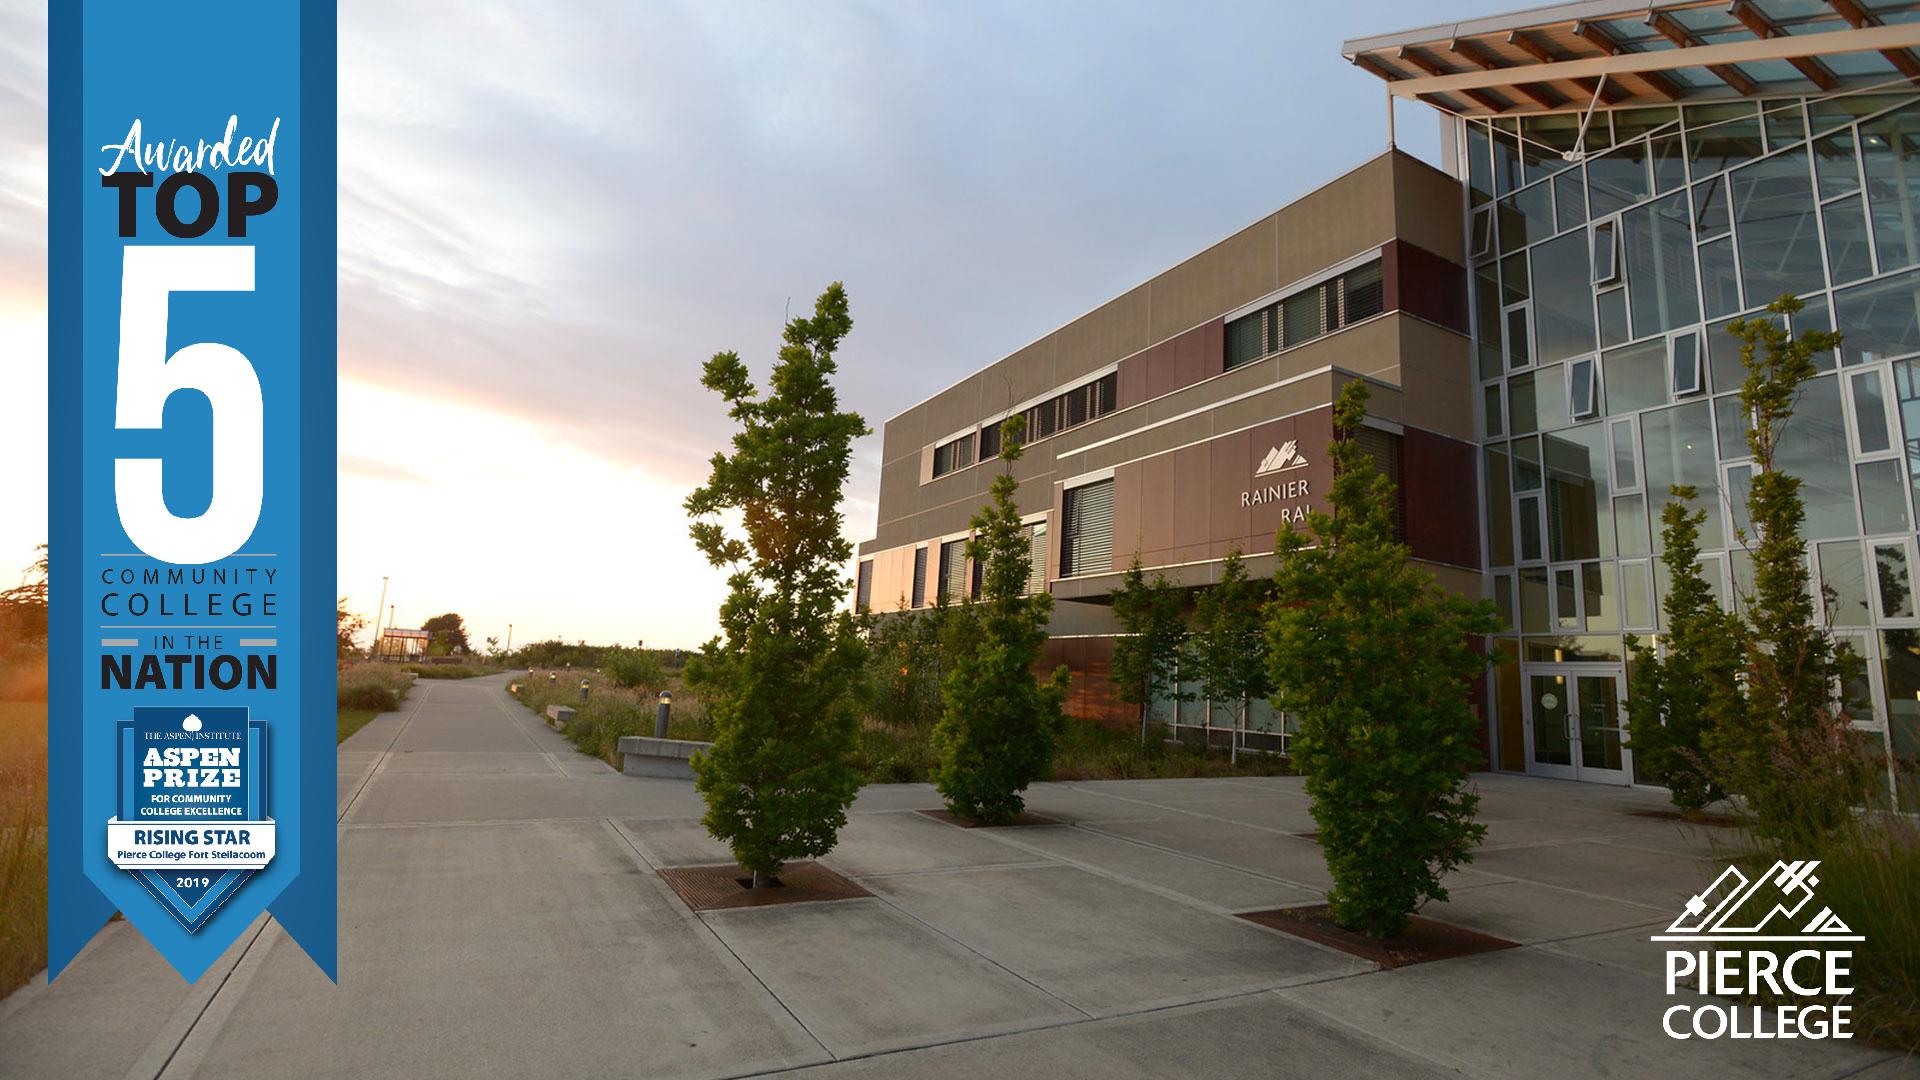 Aspen Prize Top Five Community College logo and Rainier Building, Fort Steilacoom campus